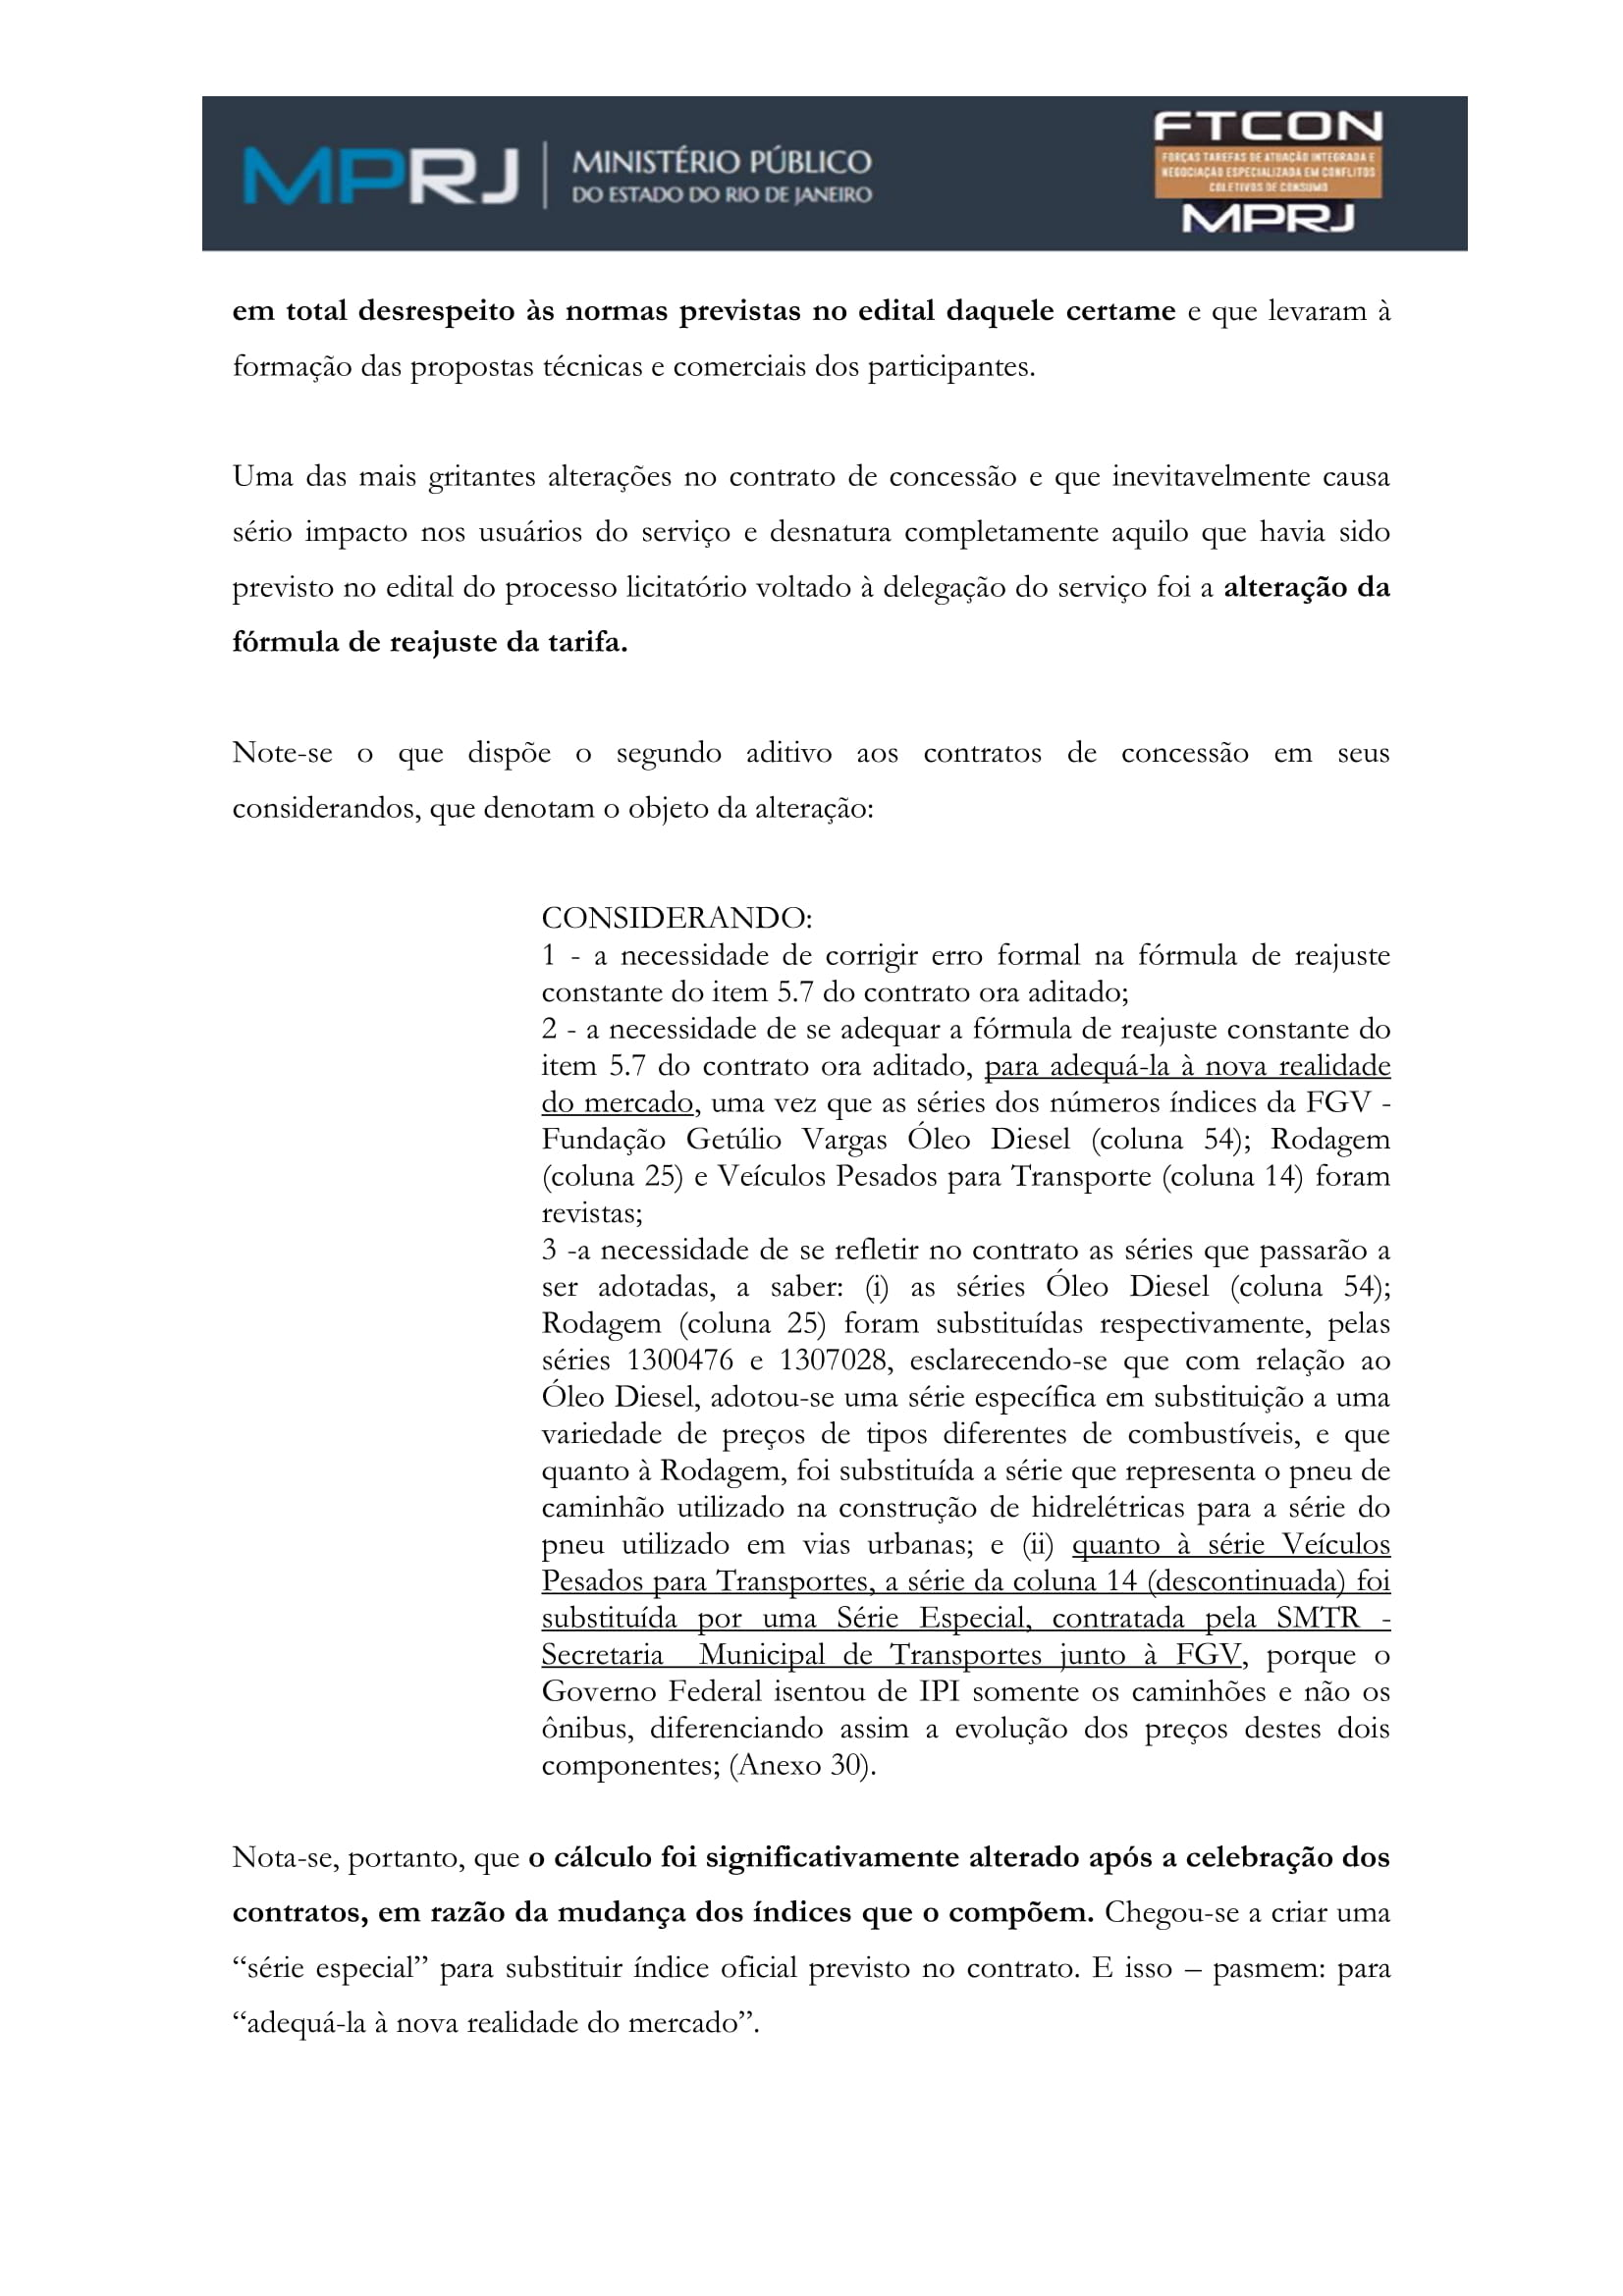 acp_caducidade_onibus_dr_rt-056